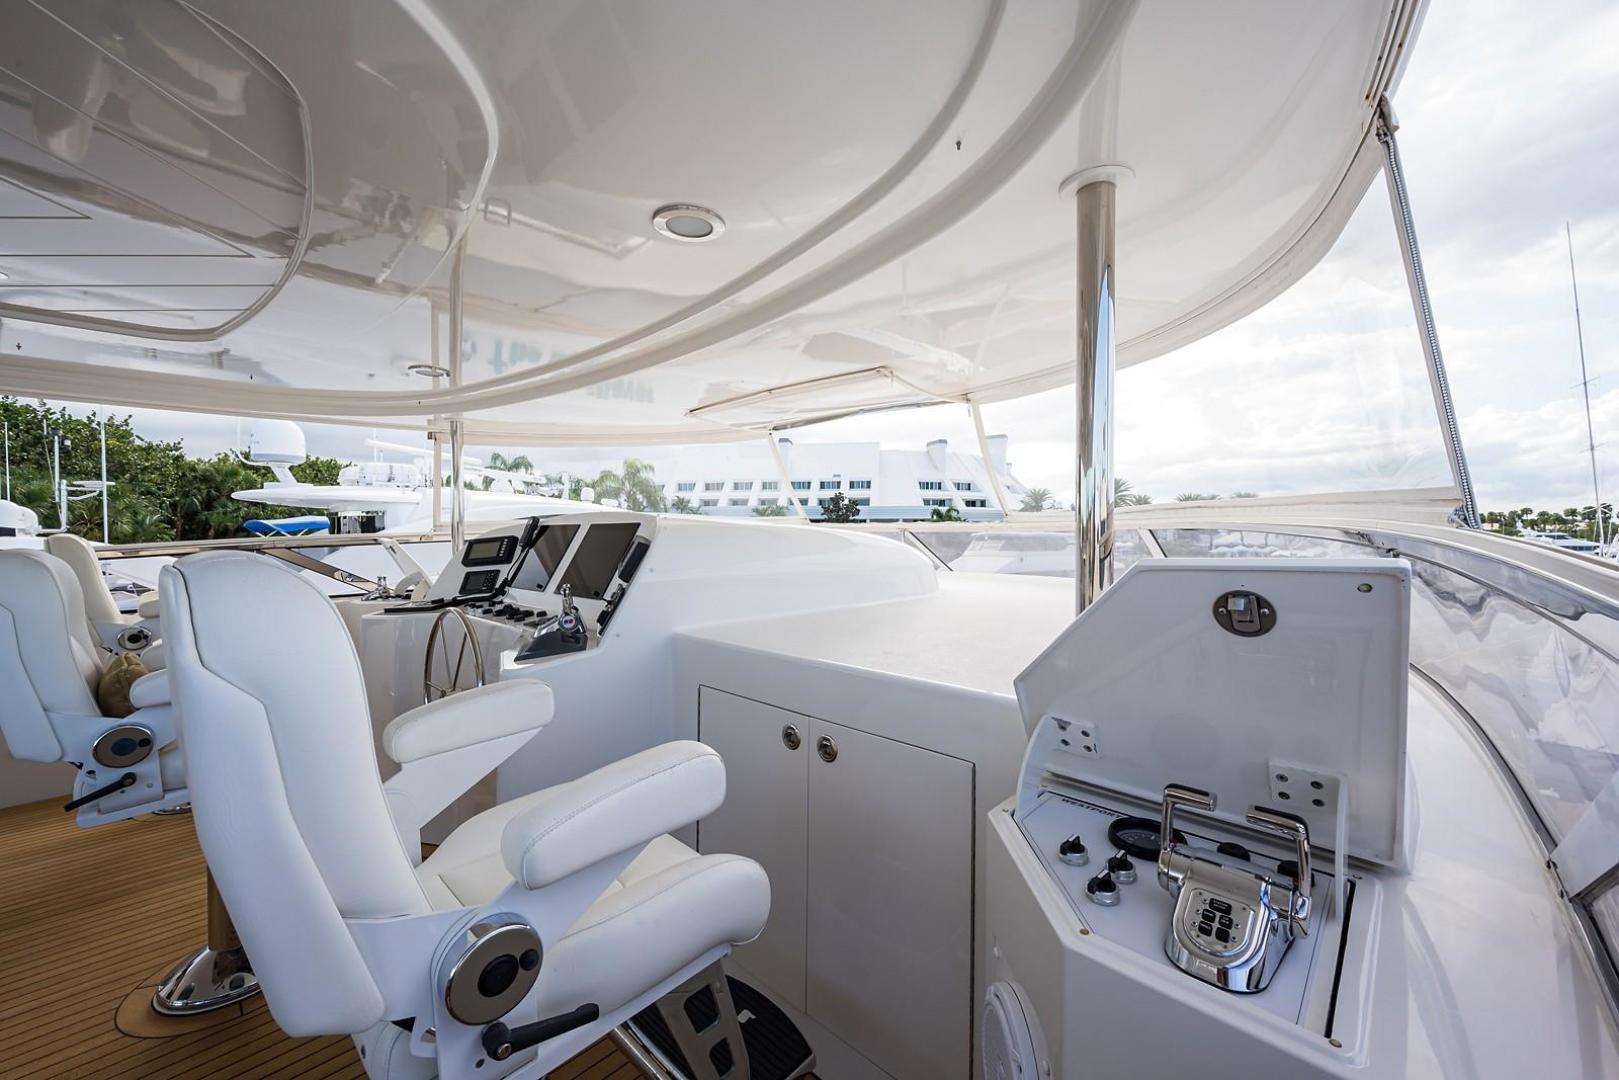 Westport-Motoryacht 2010-Cavallino Fort Lauderdale-Florida-United States-Flybridge/Helm Seats-1270086 | Thumbnail